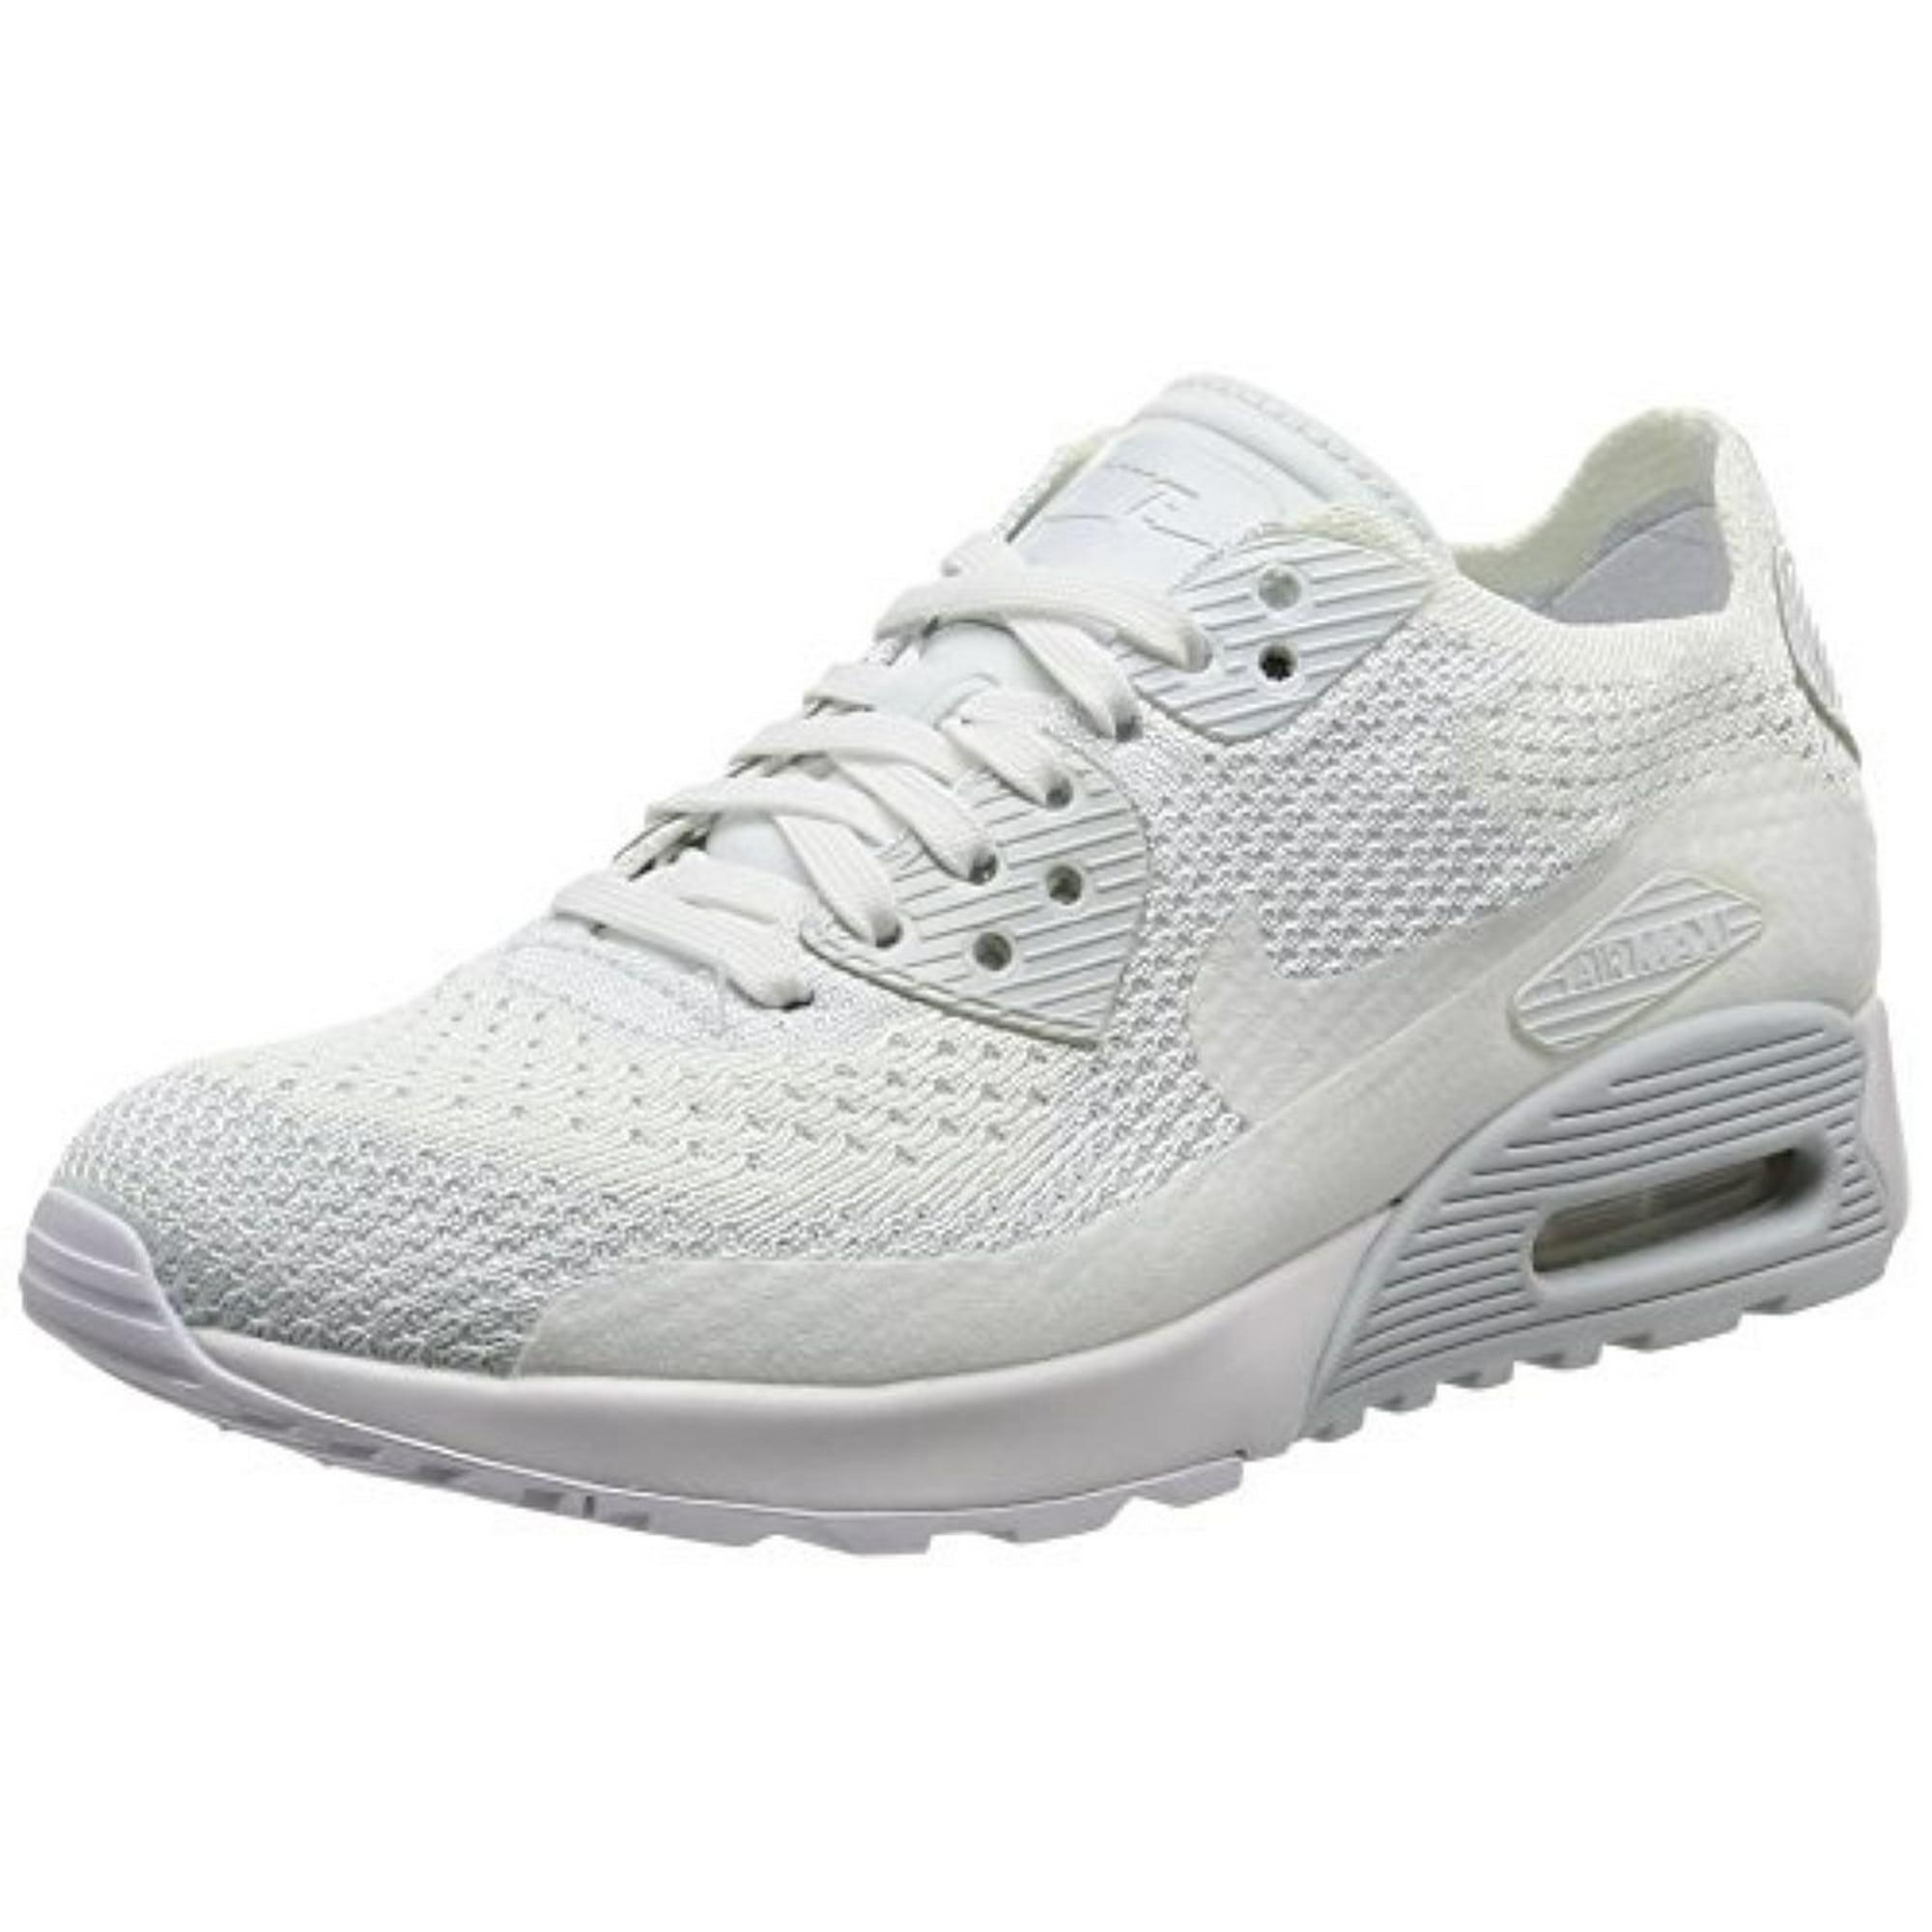 W Nike Air Max 90 Ultra 2.0 Flyknit 881109 104 Size 6.5